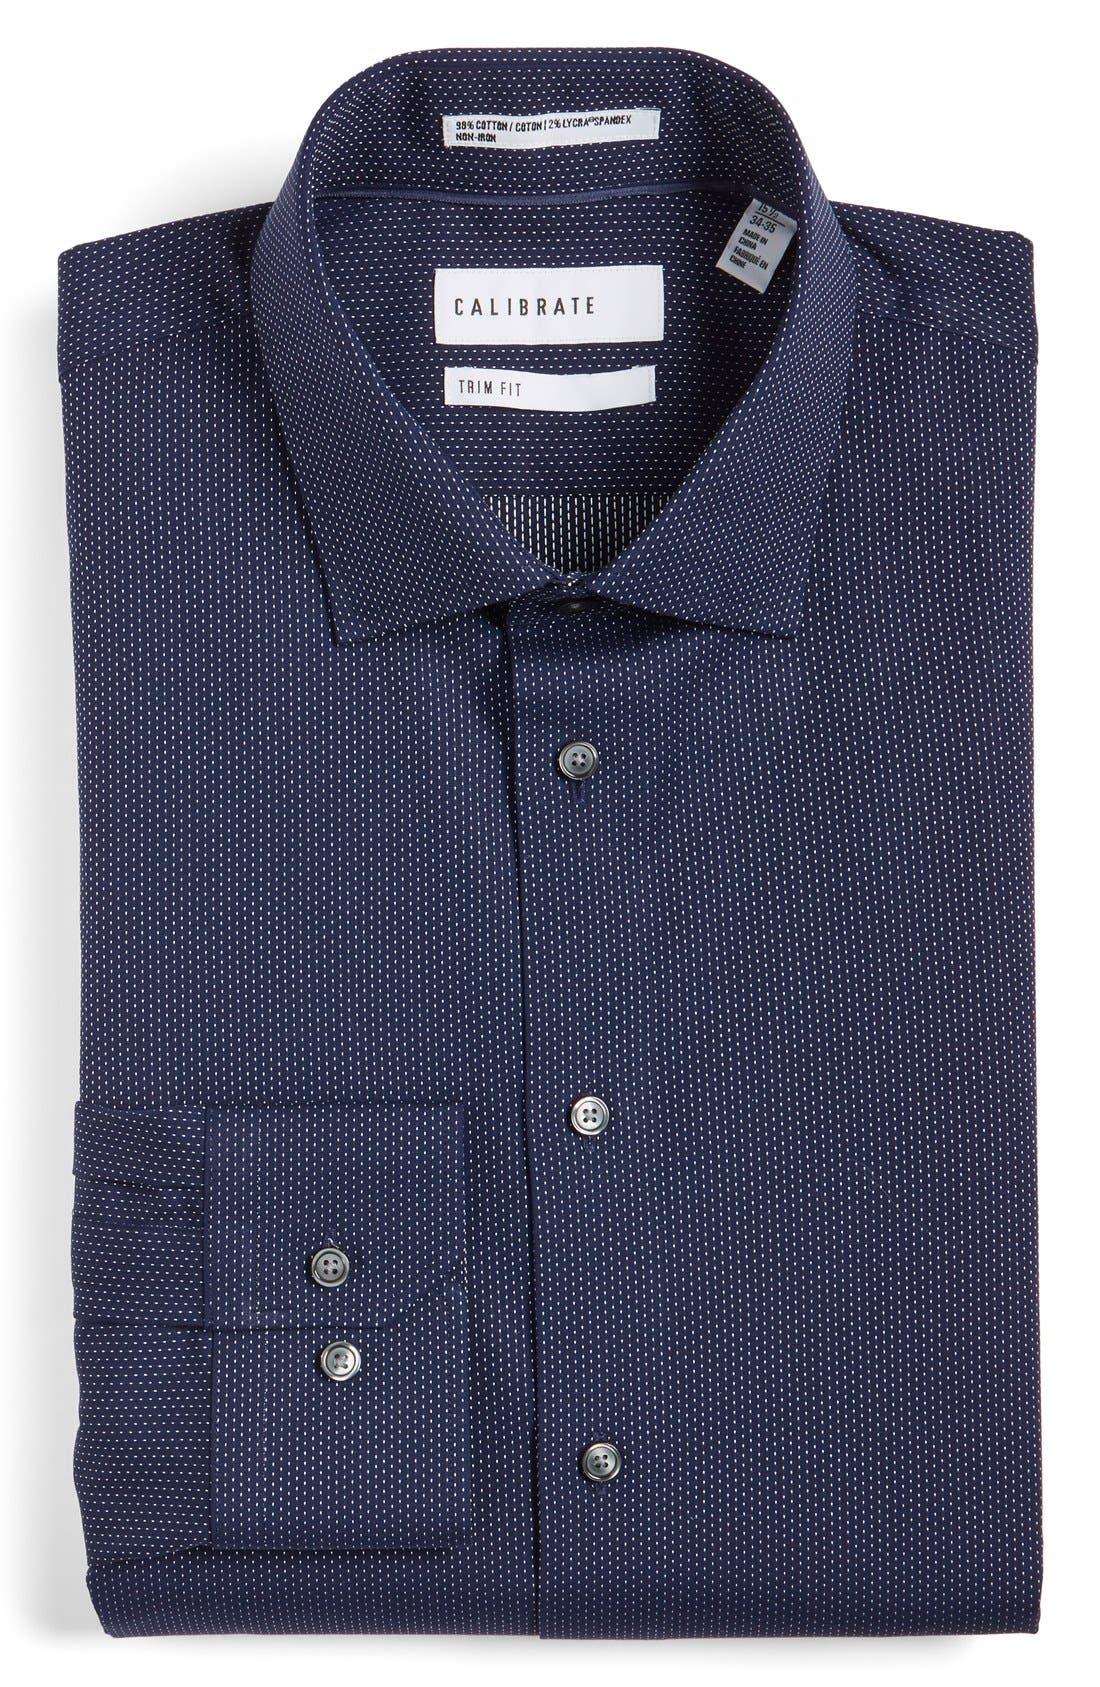 Calibrate Trim Fit Non-Iron Microdot Dress Shirt